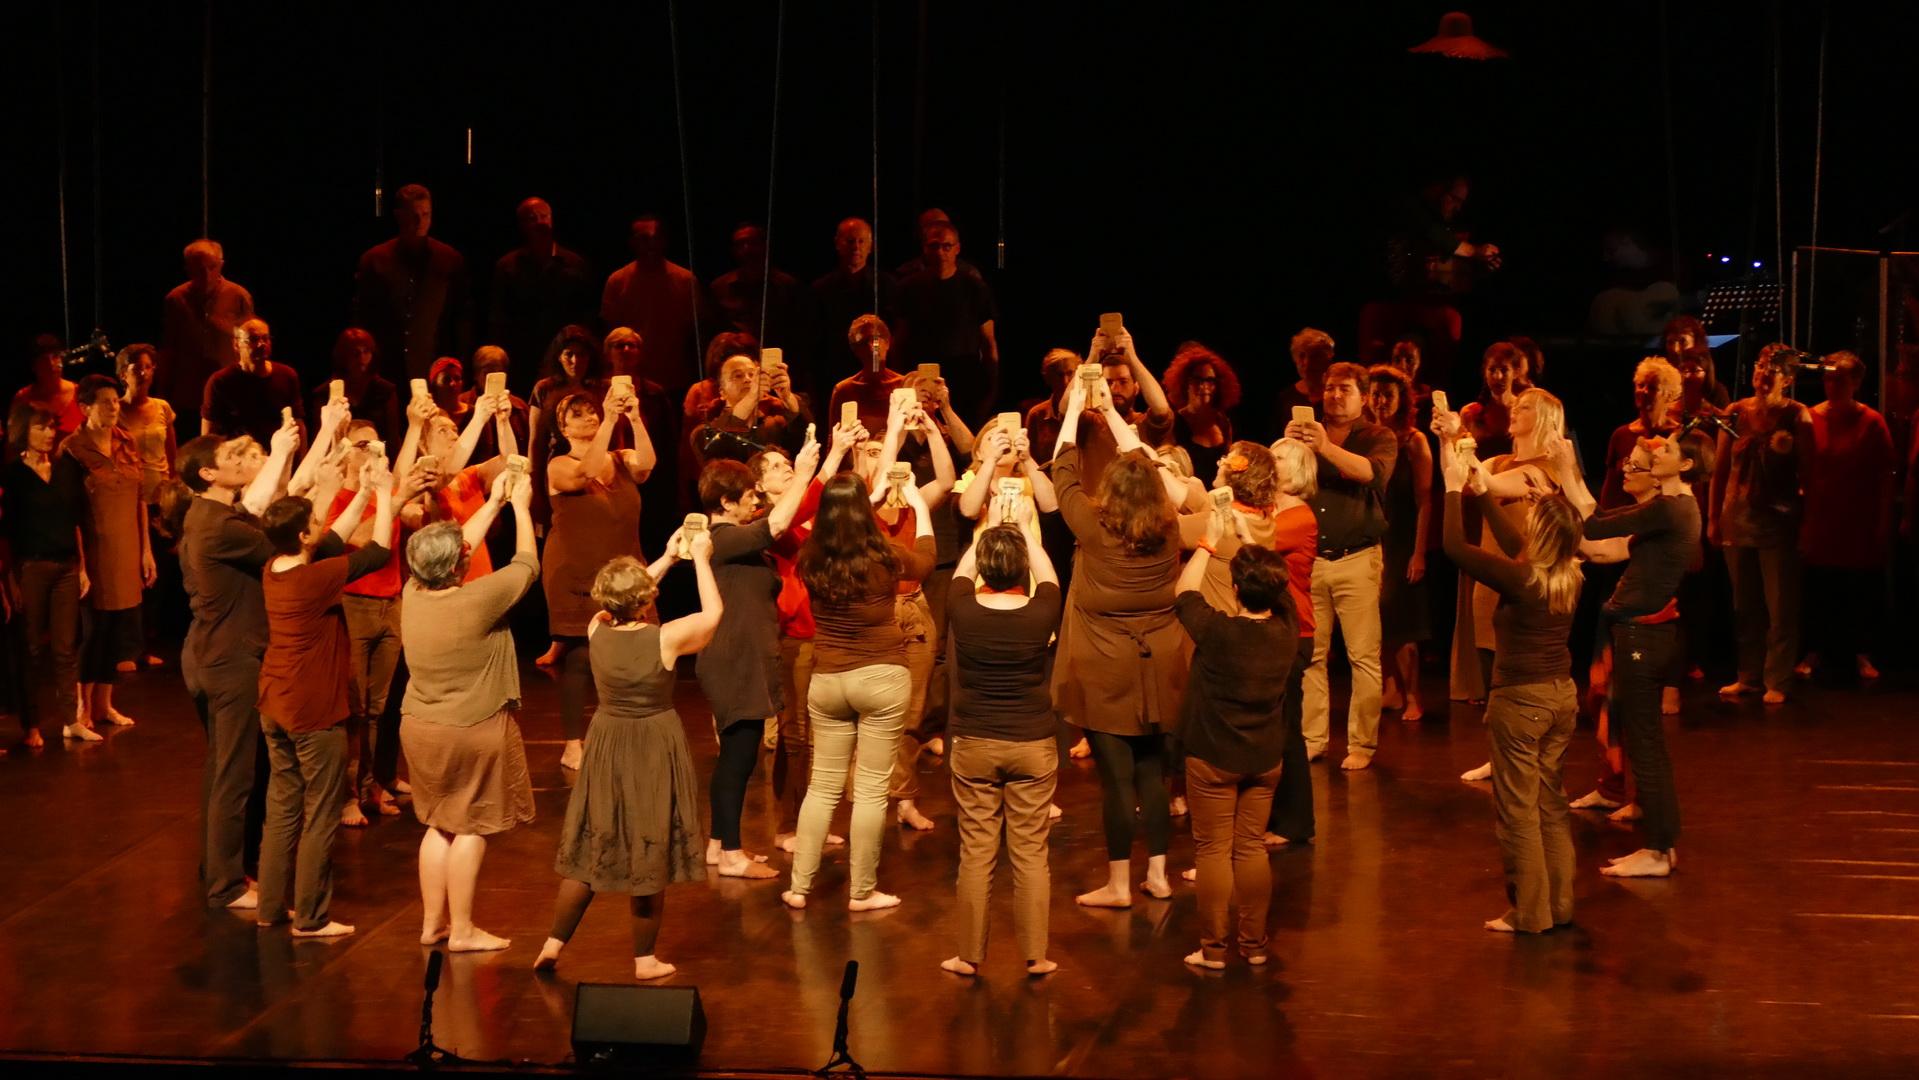 LFDS_concert_ailleurs (73)